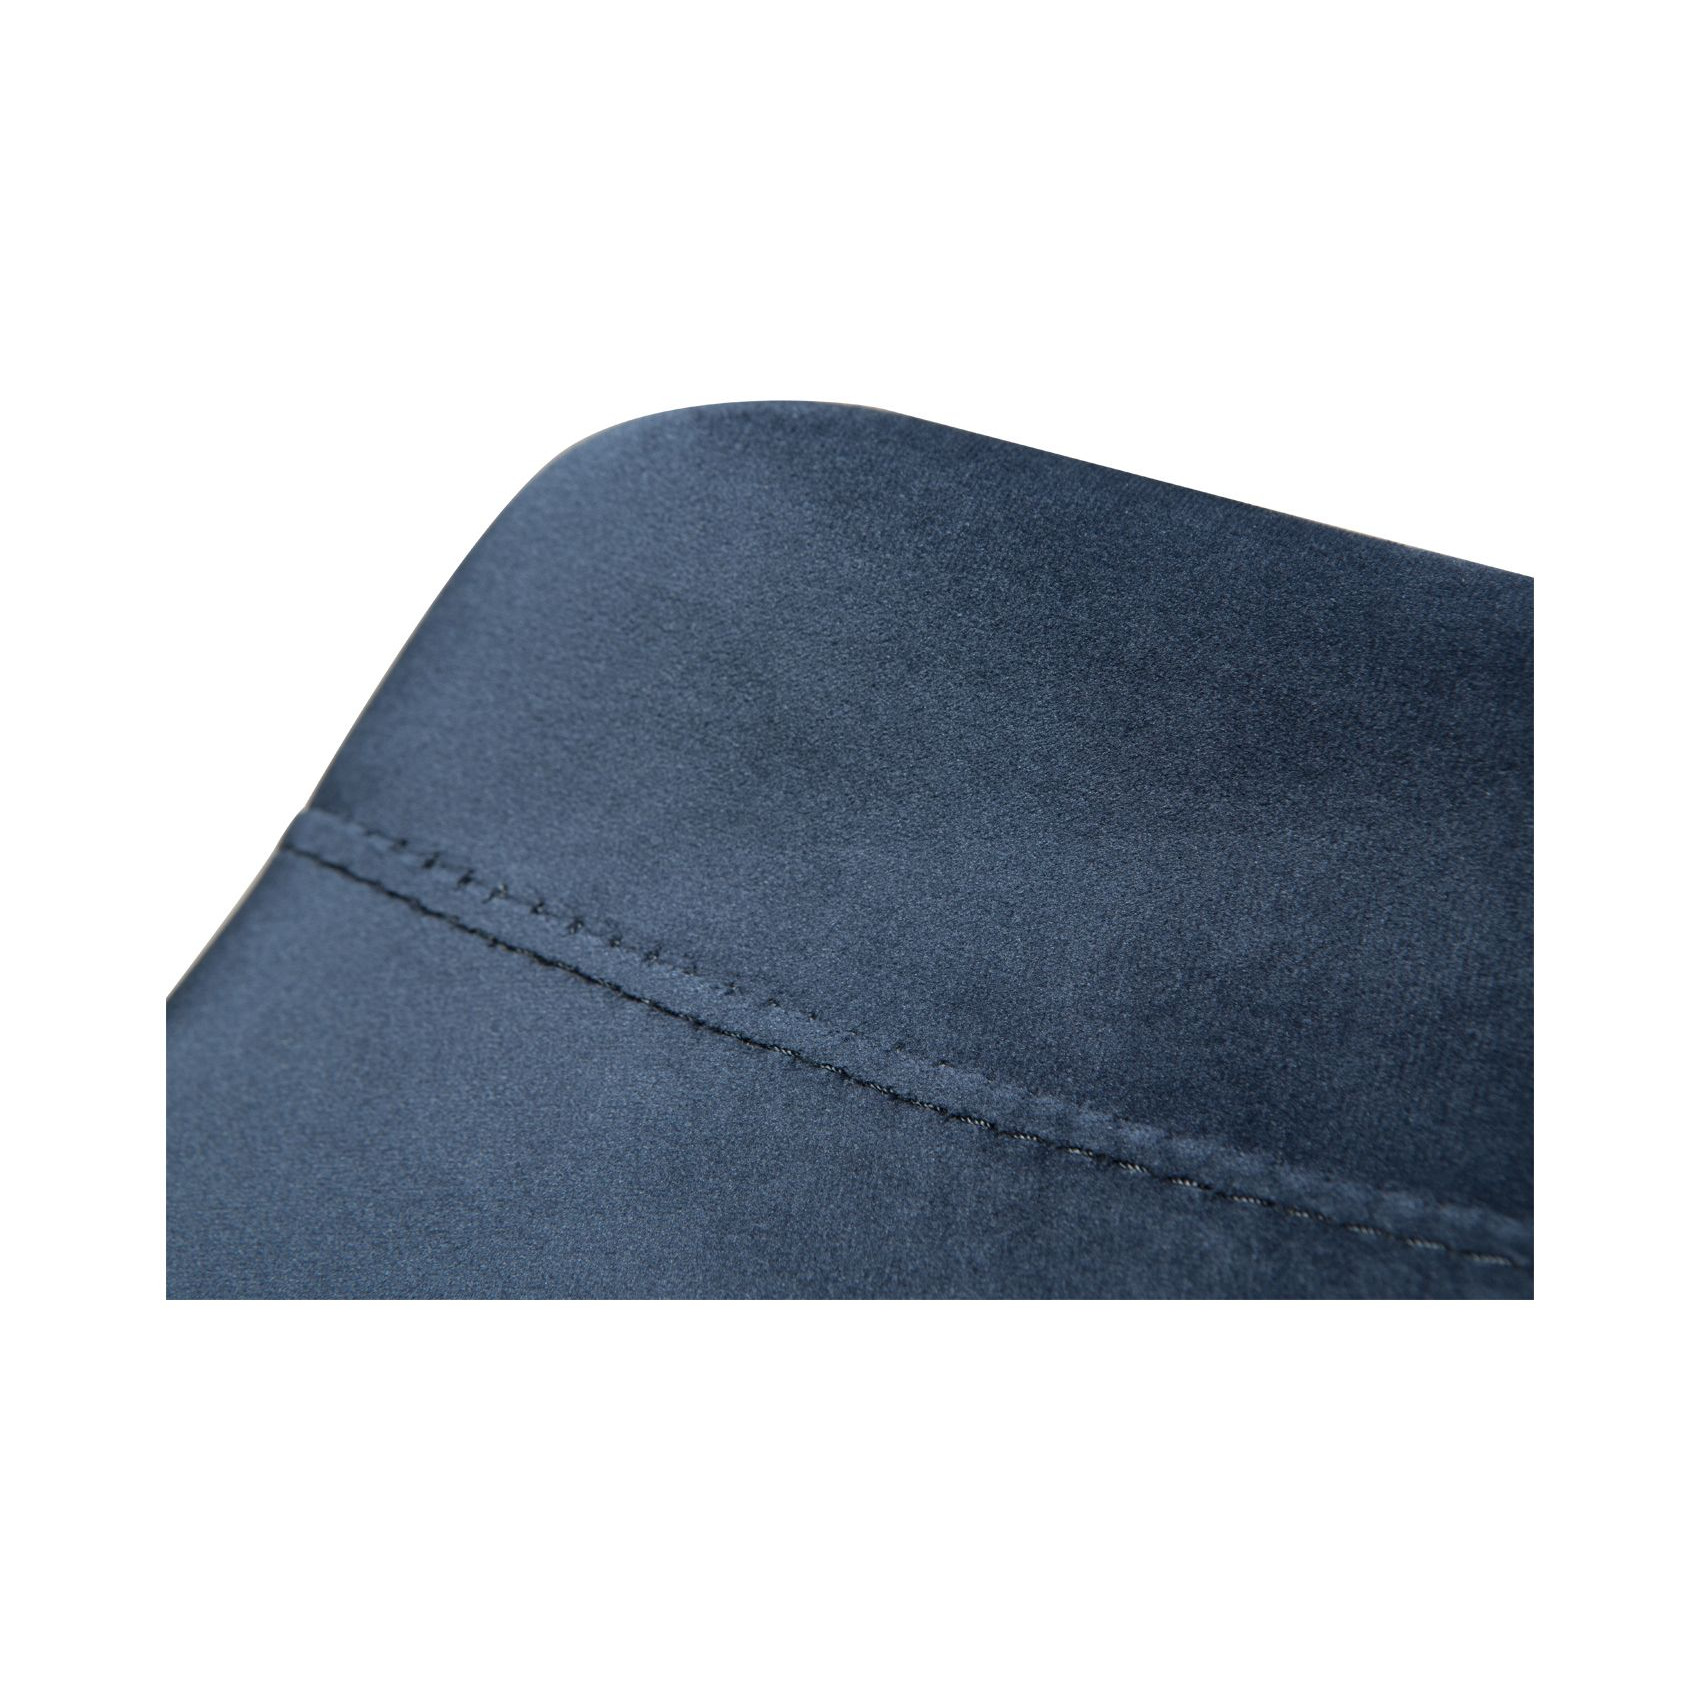 Barhocker-Hype Samt   Blau